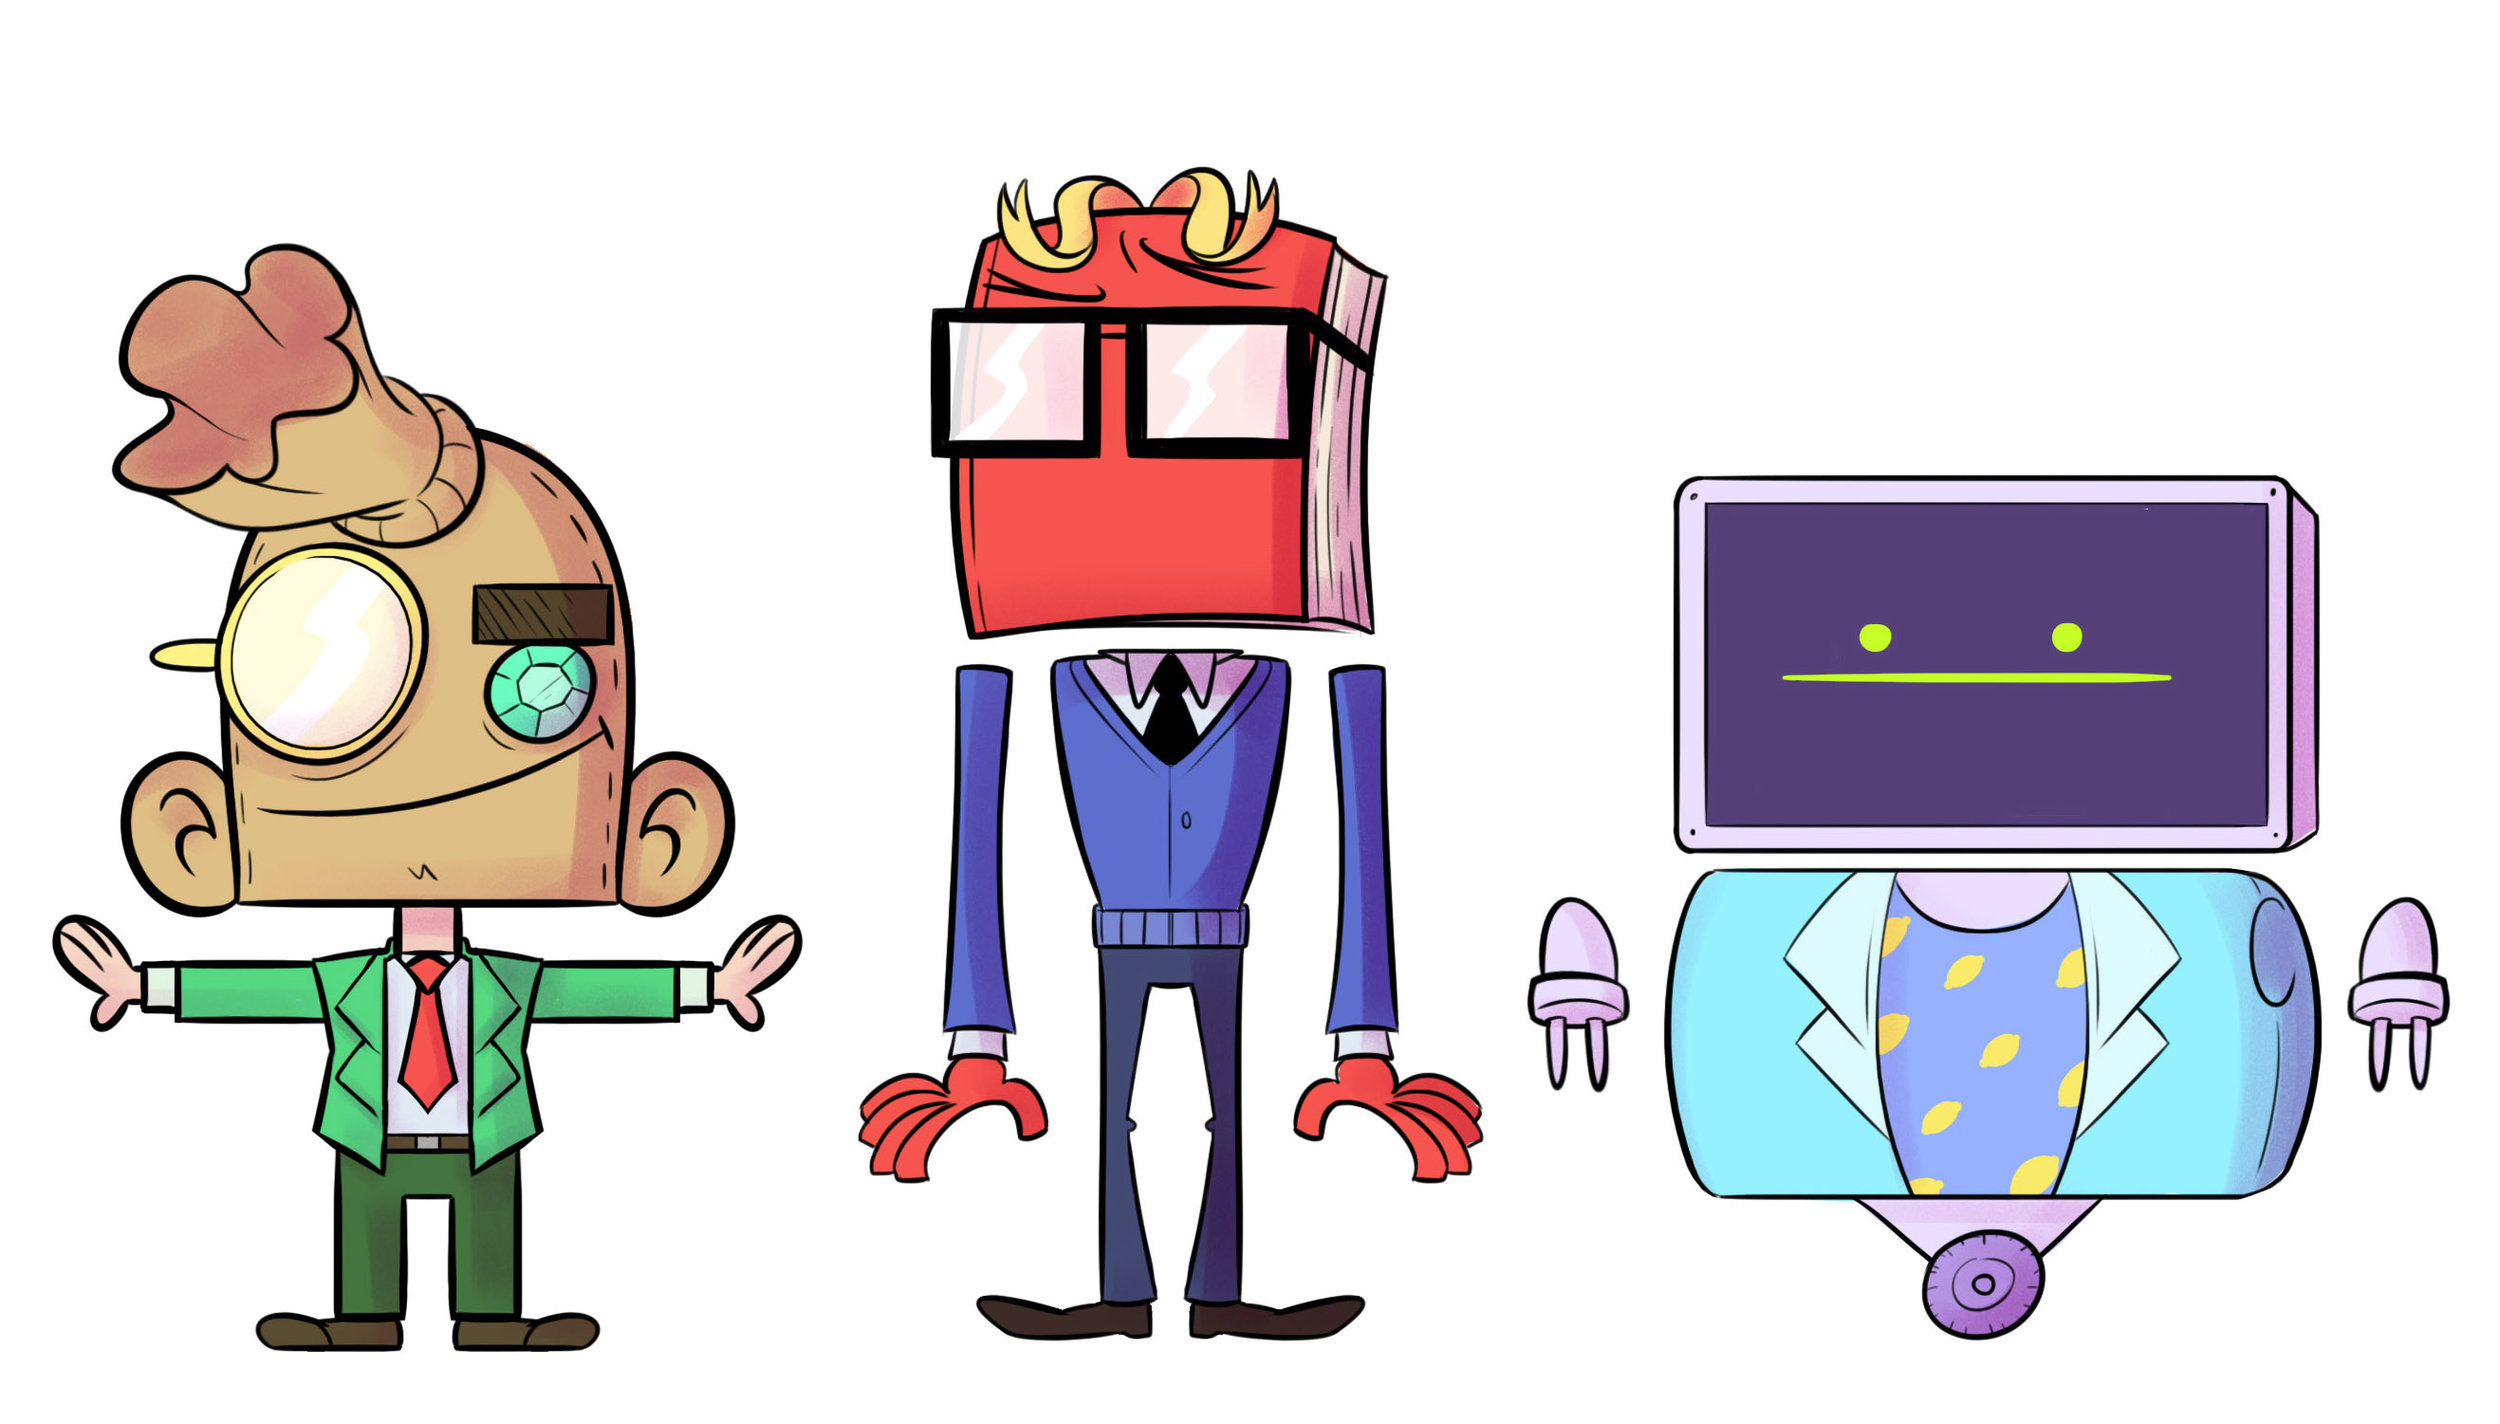 charactercolours1.jpg